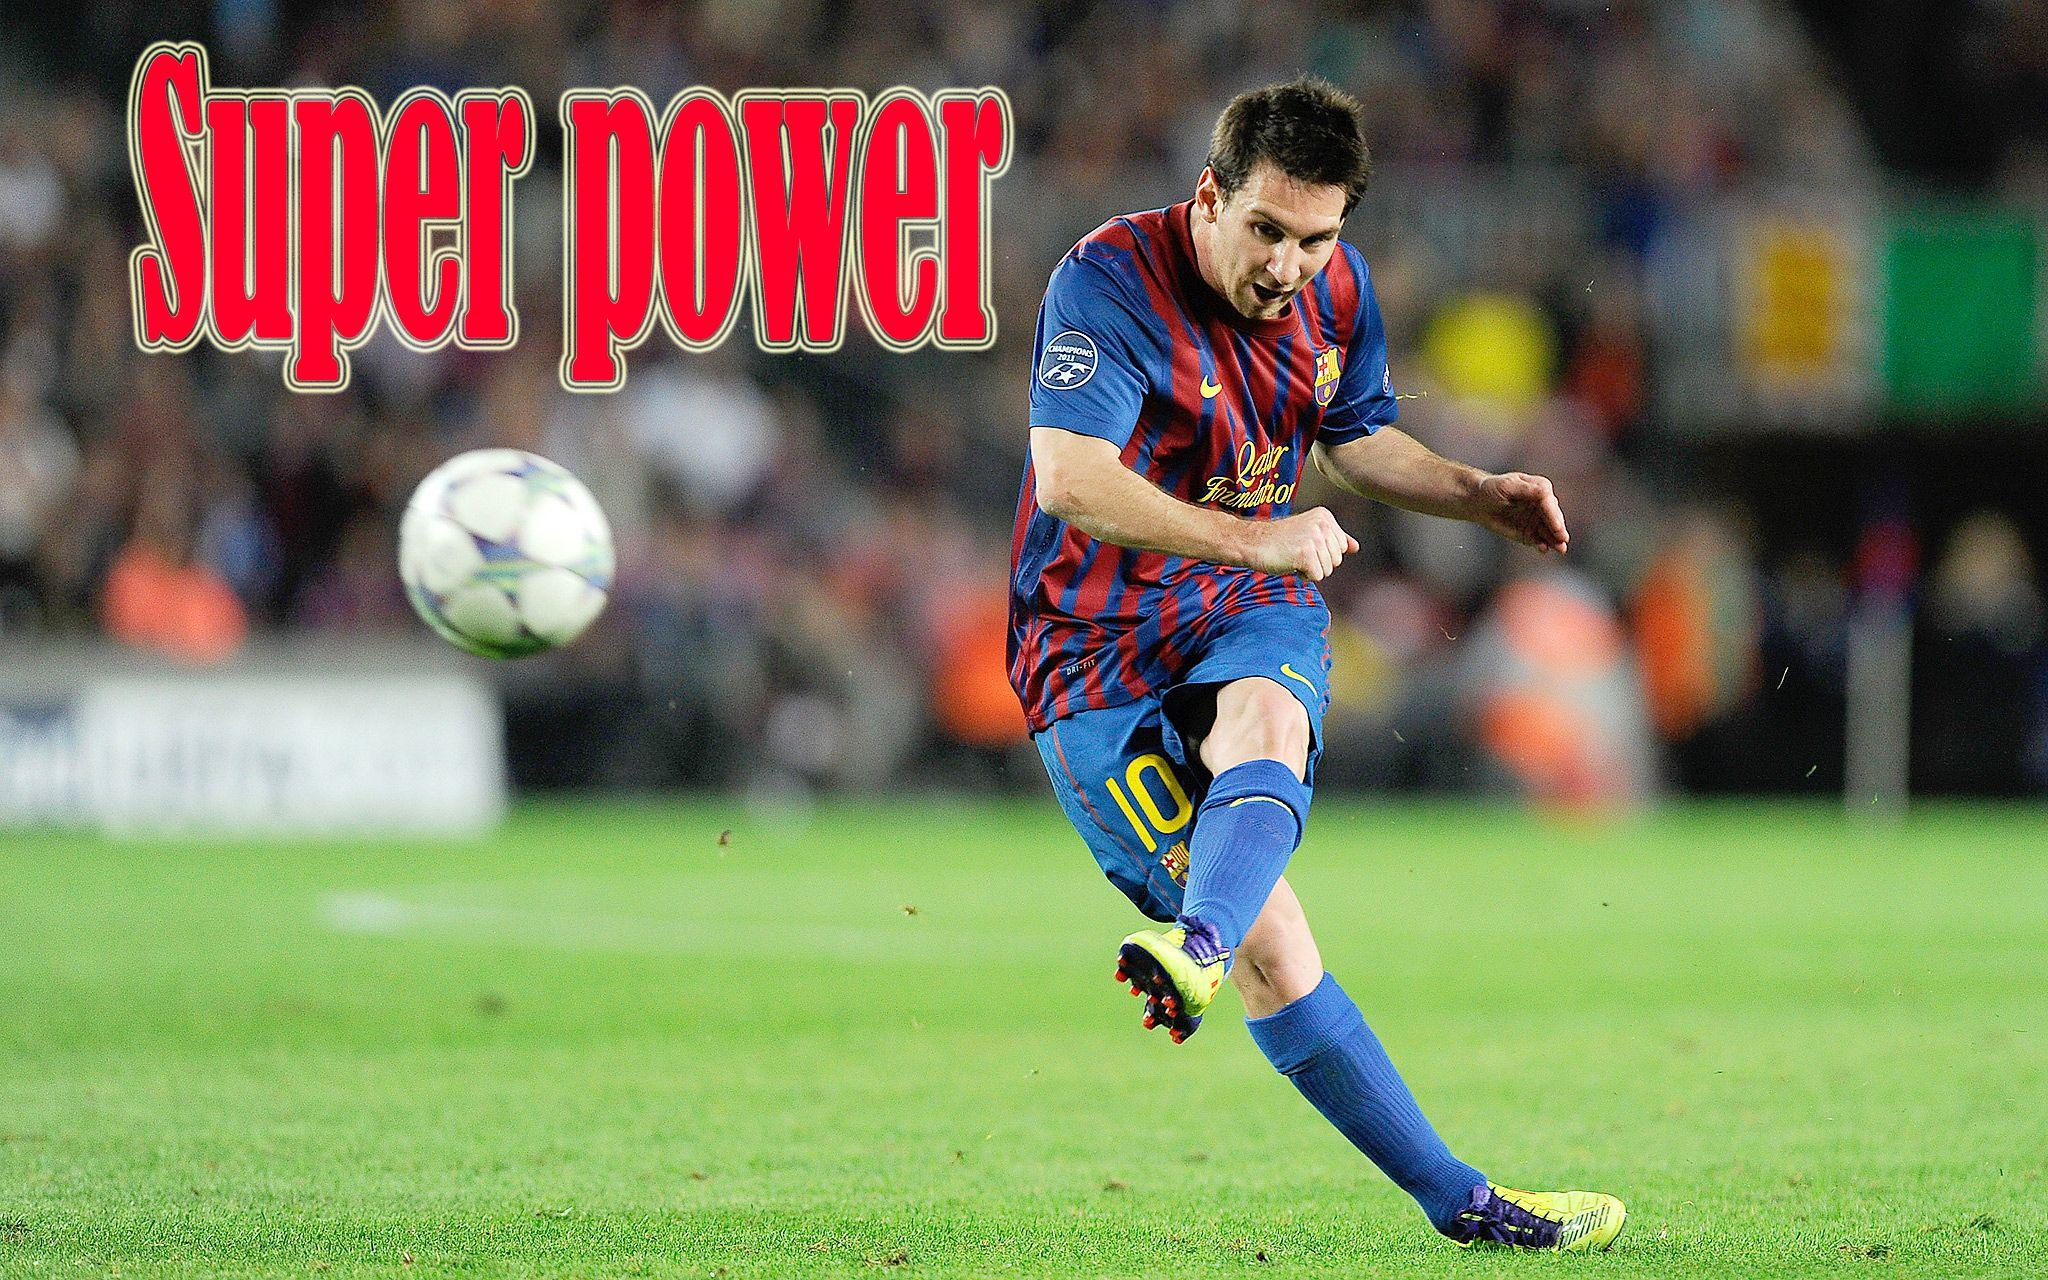 Pin On Best Soccer